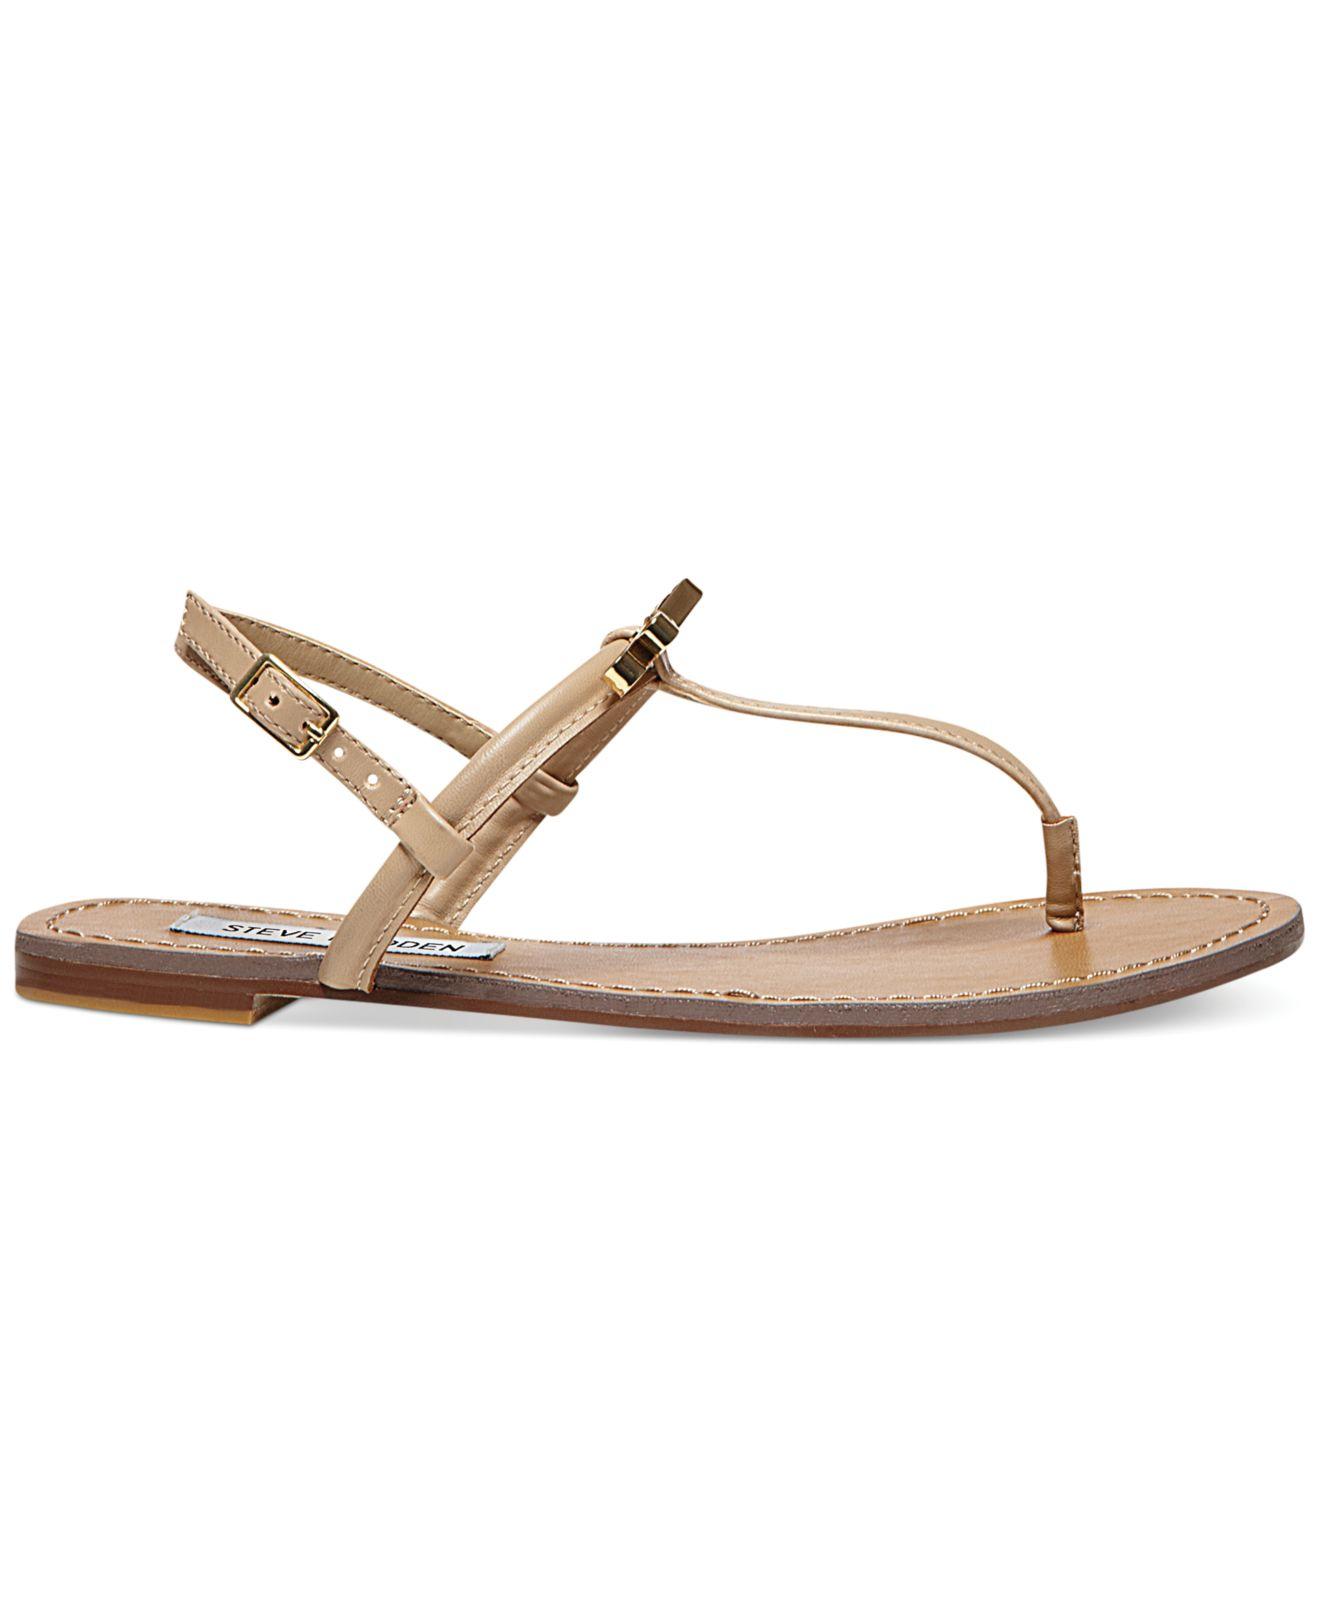 8de00ab19fdc1 Lyst - Steve Madden Women S Daisey Flat Thong Sandals in Natural